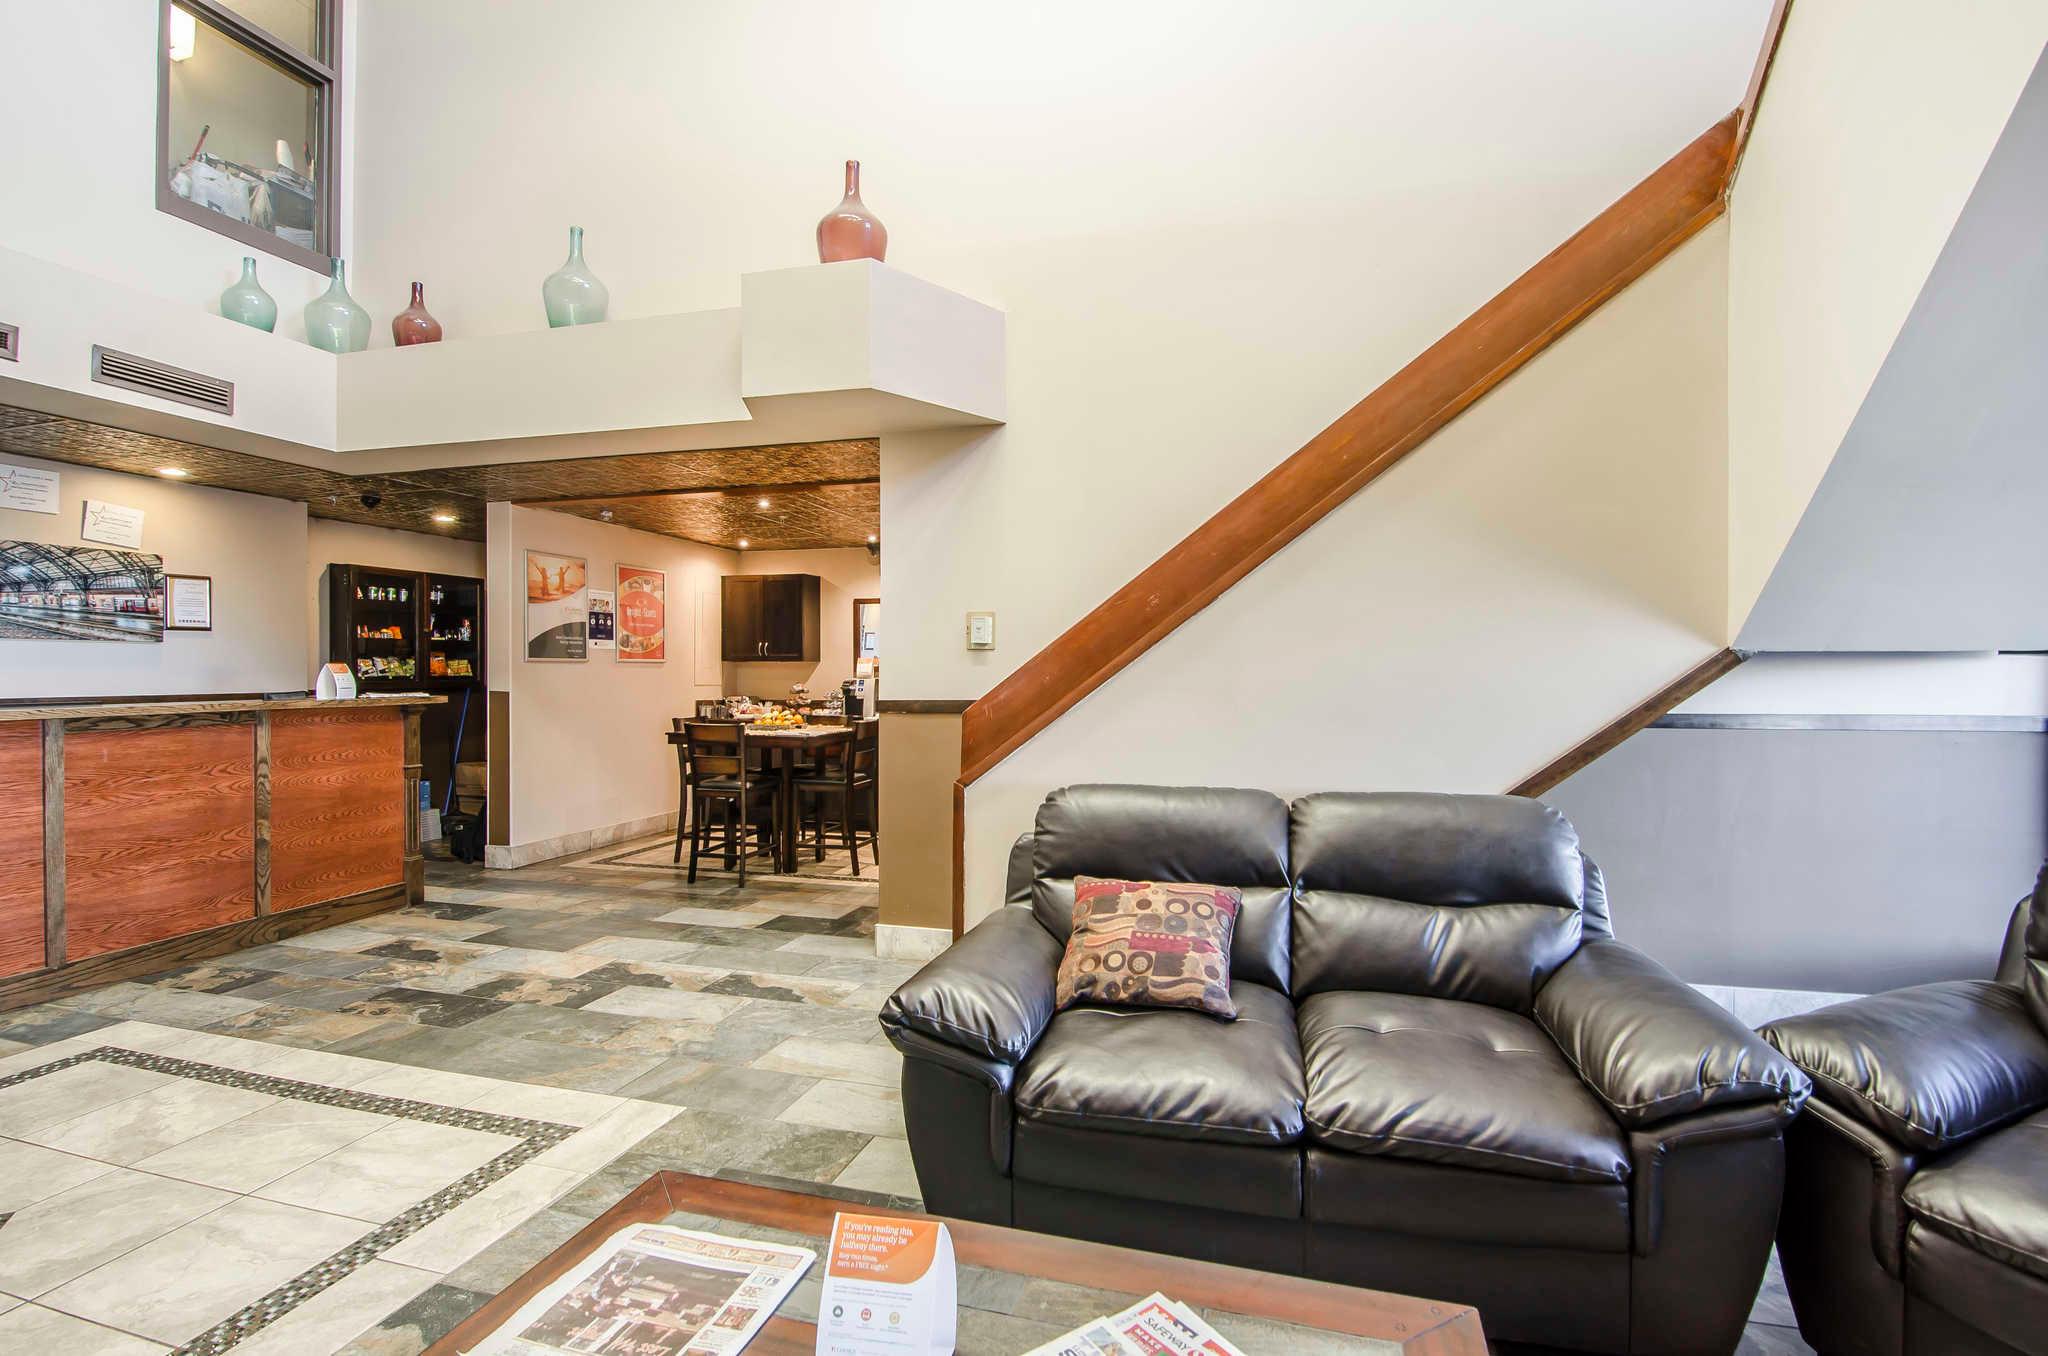 Econo Lodge Lloydminster (780)875-6101